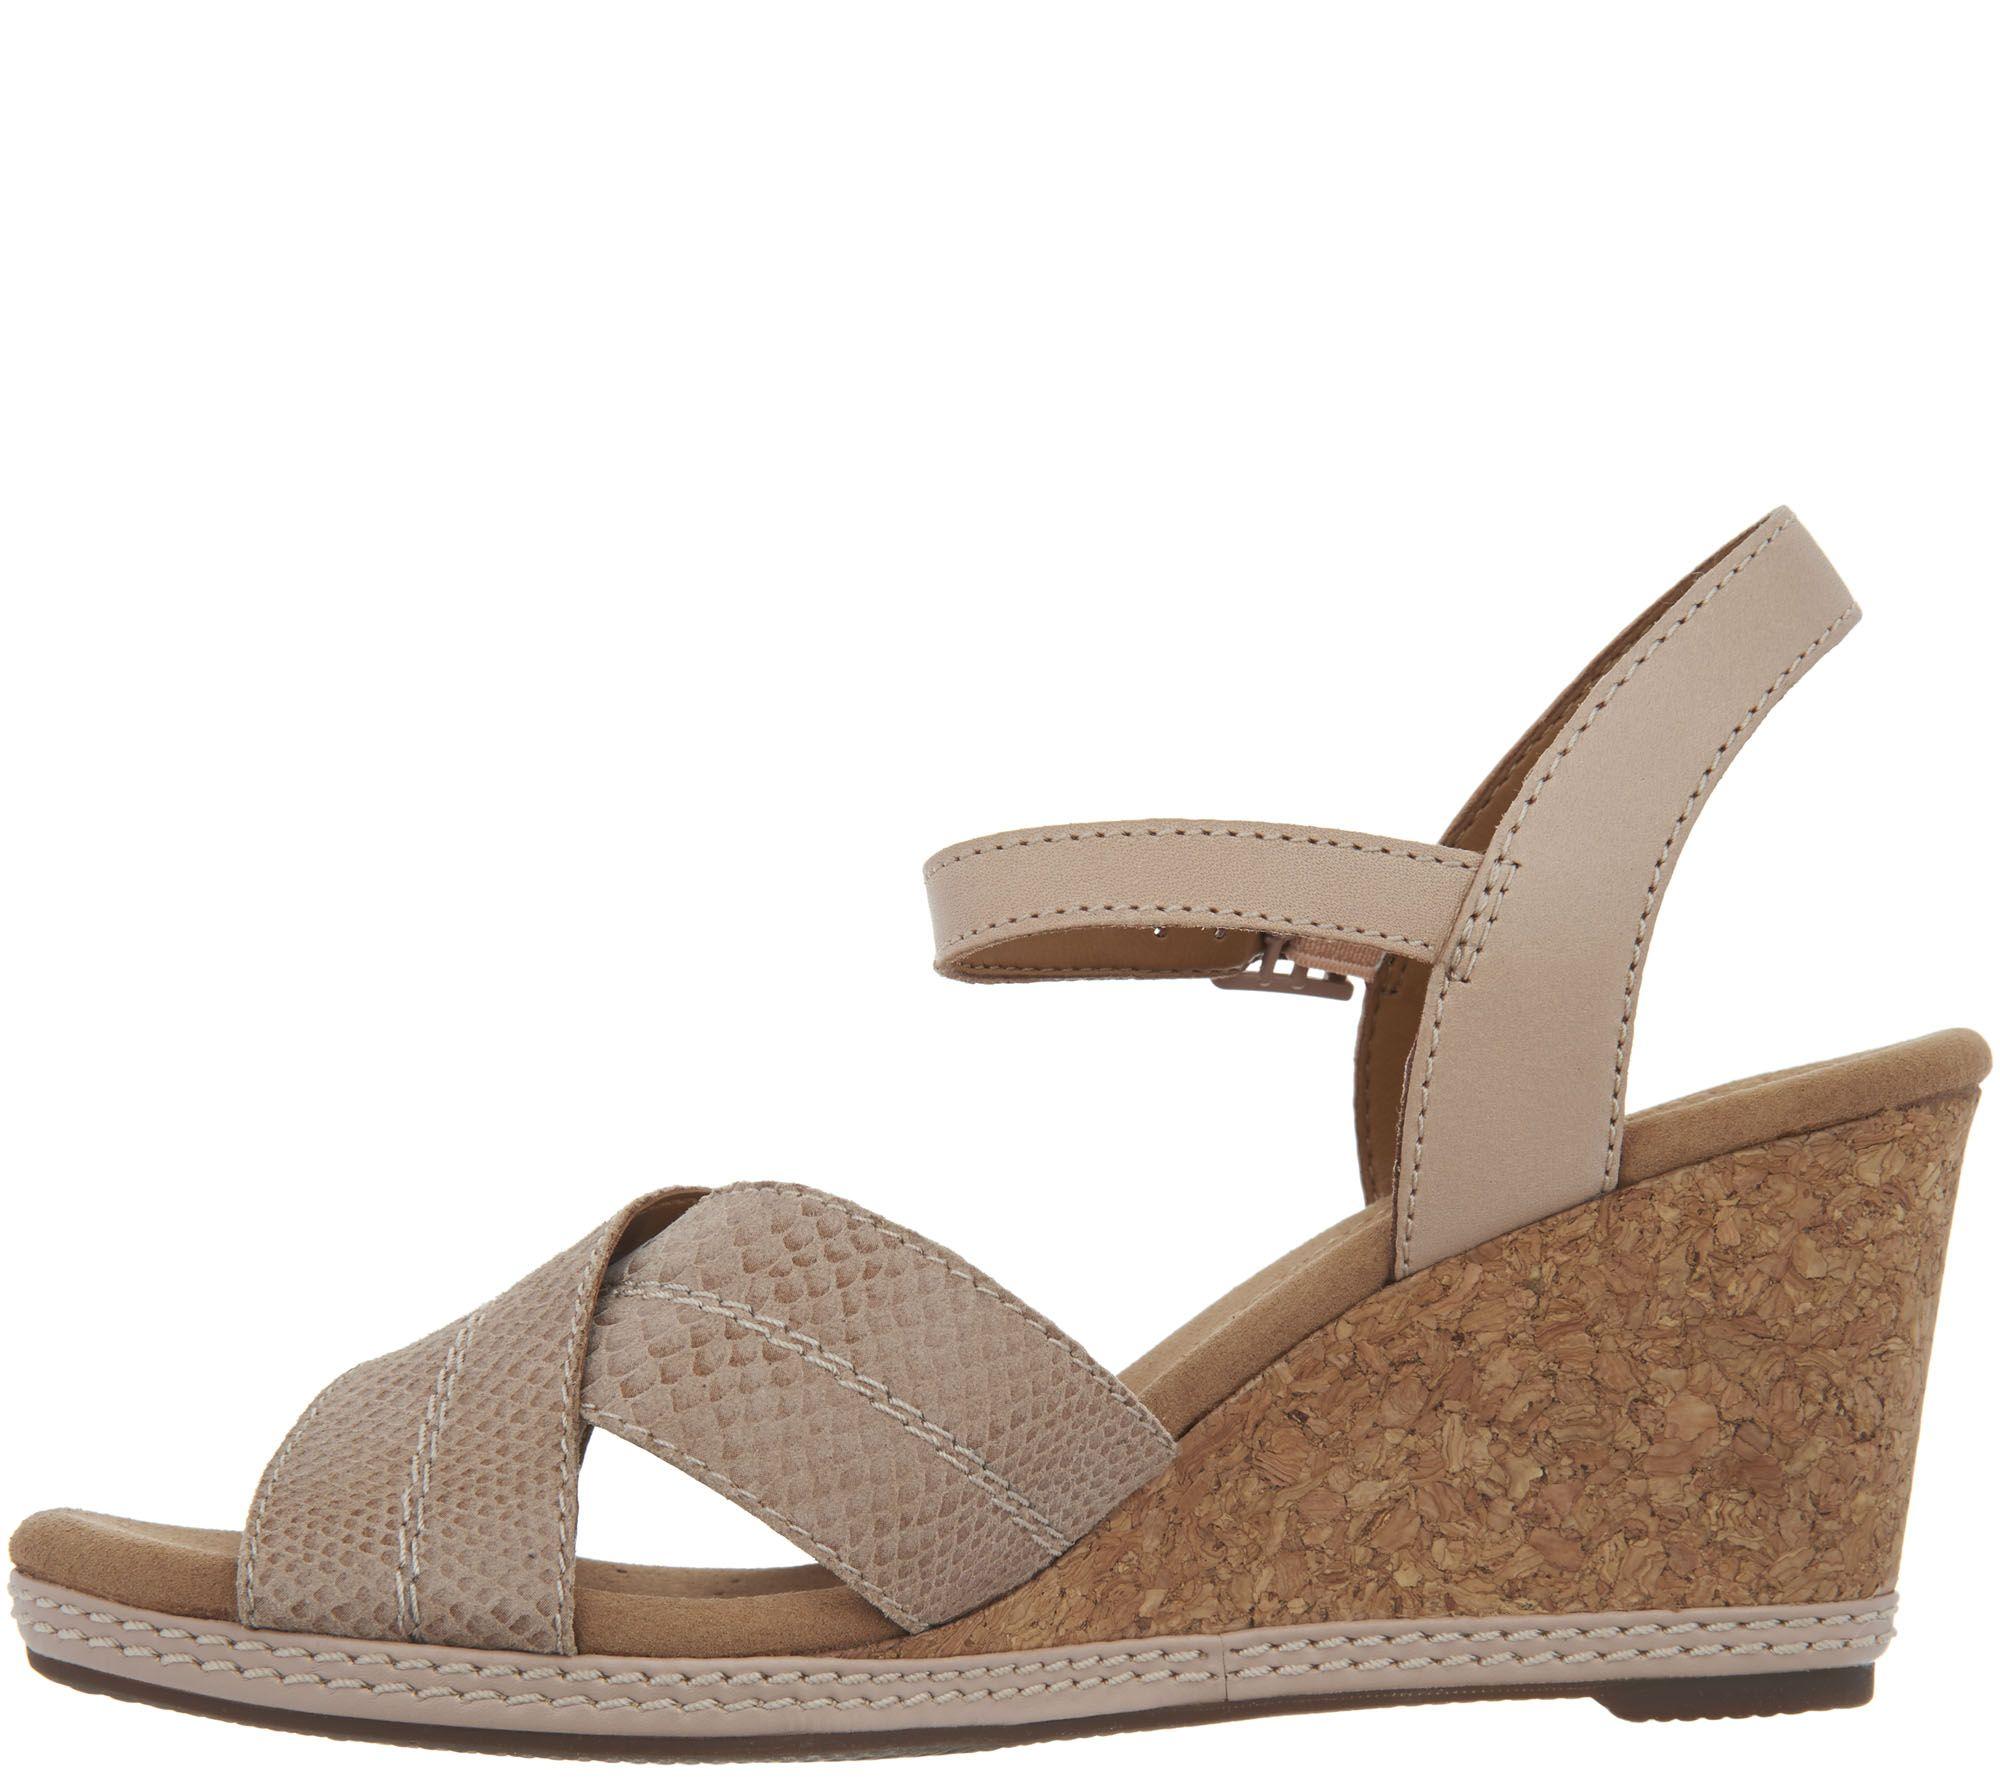 1e4407a6c2d5 Clarks Leather Cork Wedge Sandals - Helio Latitude - Page 1 — QVC.com